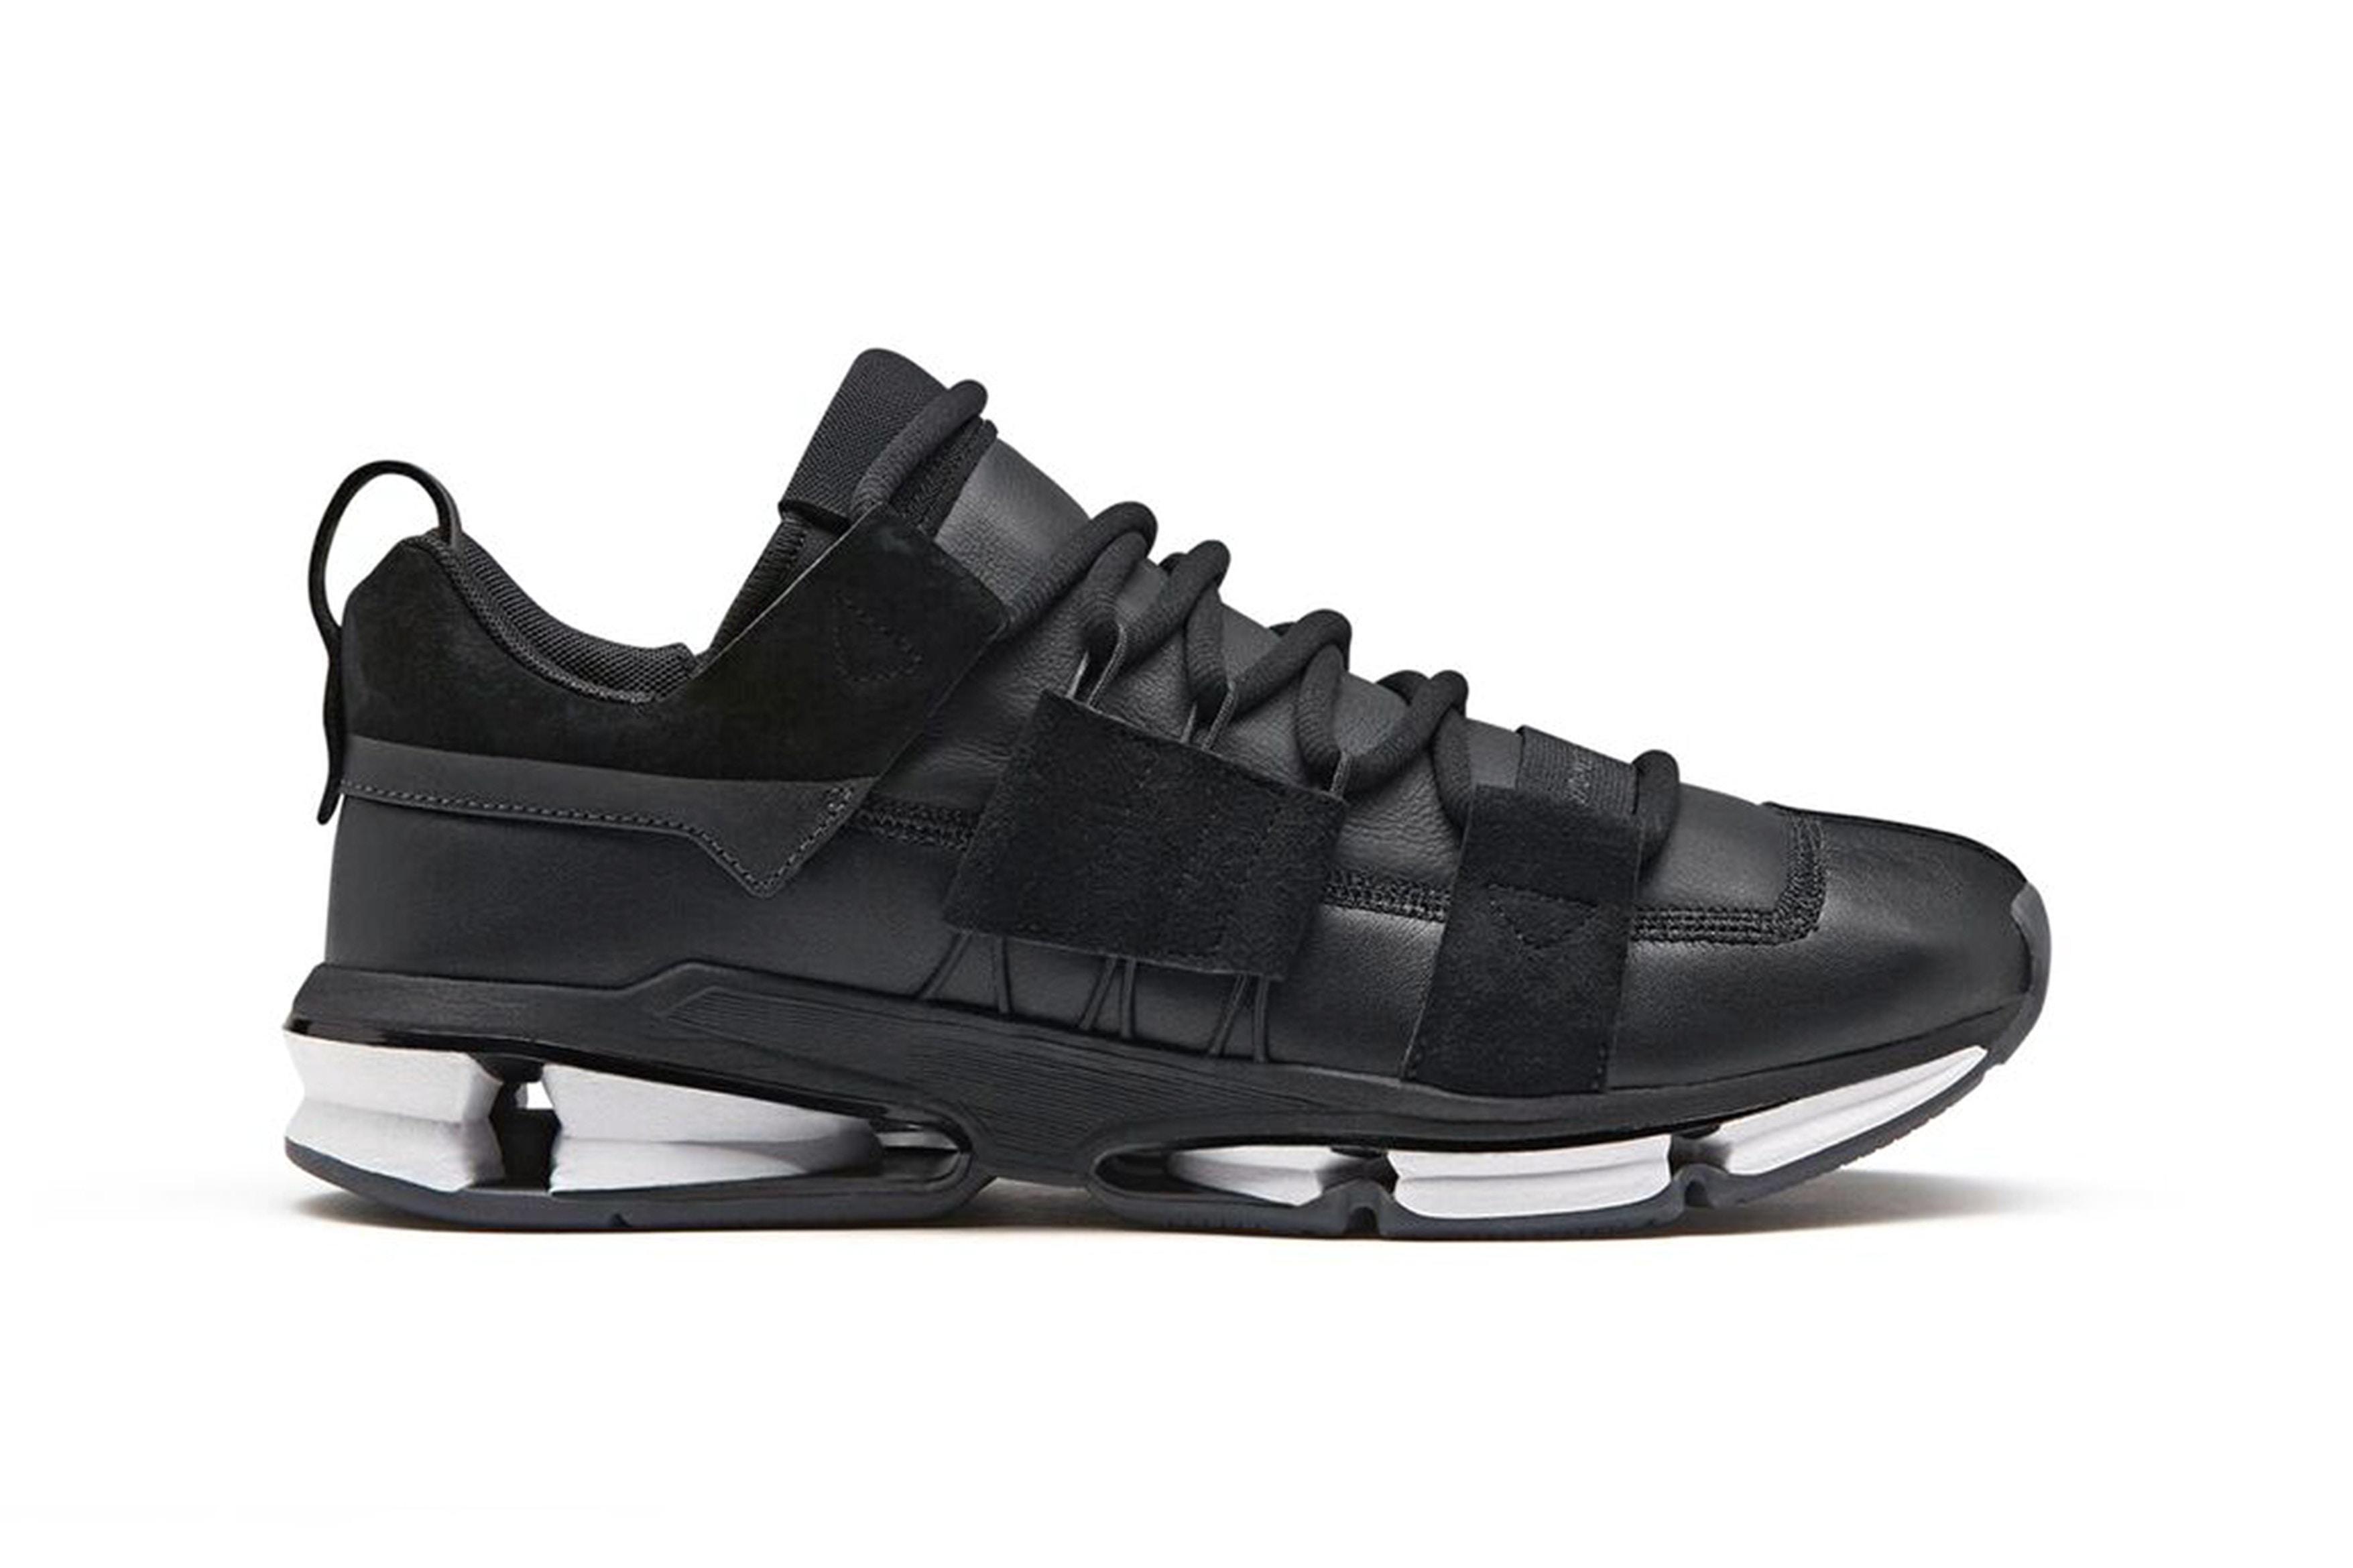 Adidas Originals Twinstrike 1 Sneaker Freaker